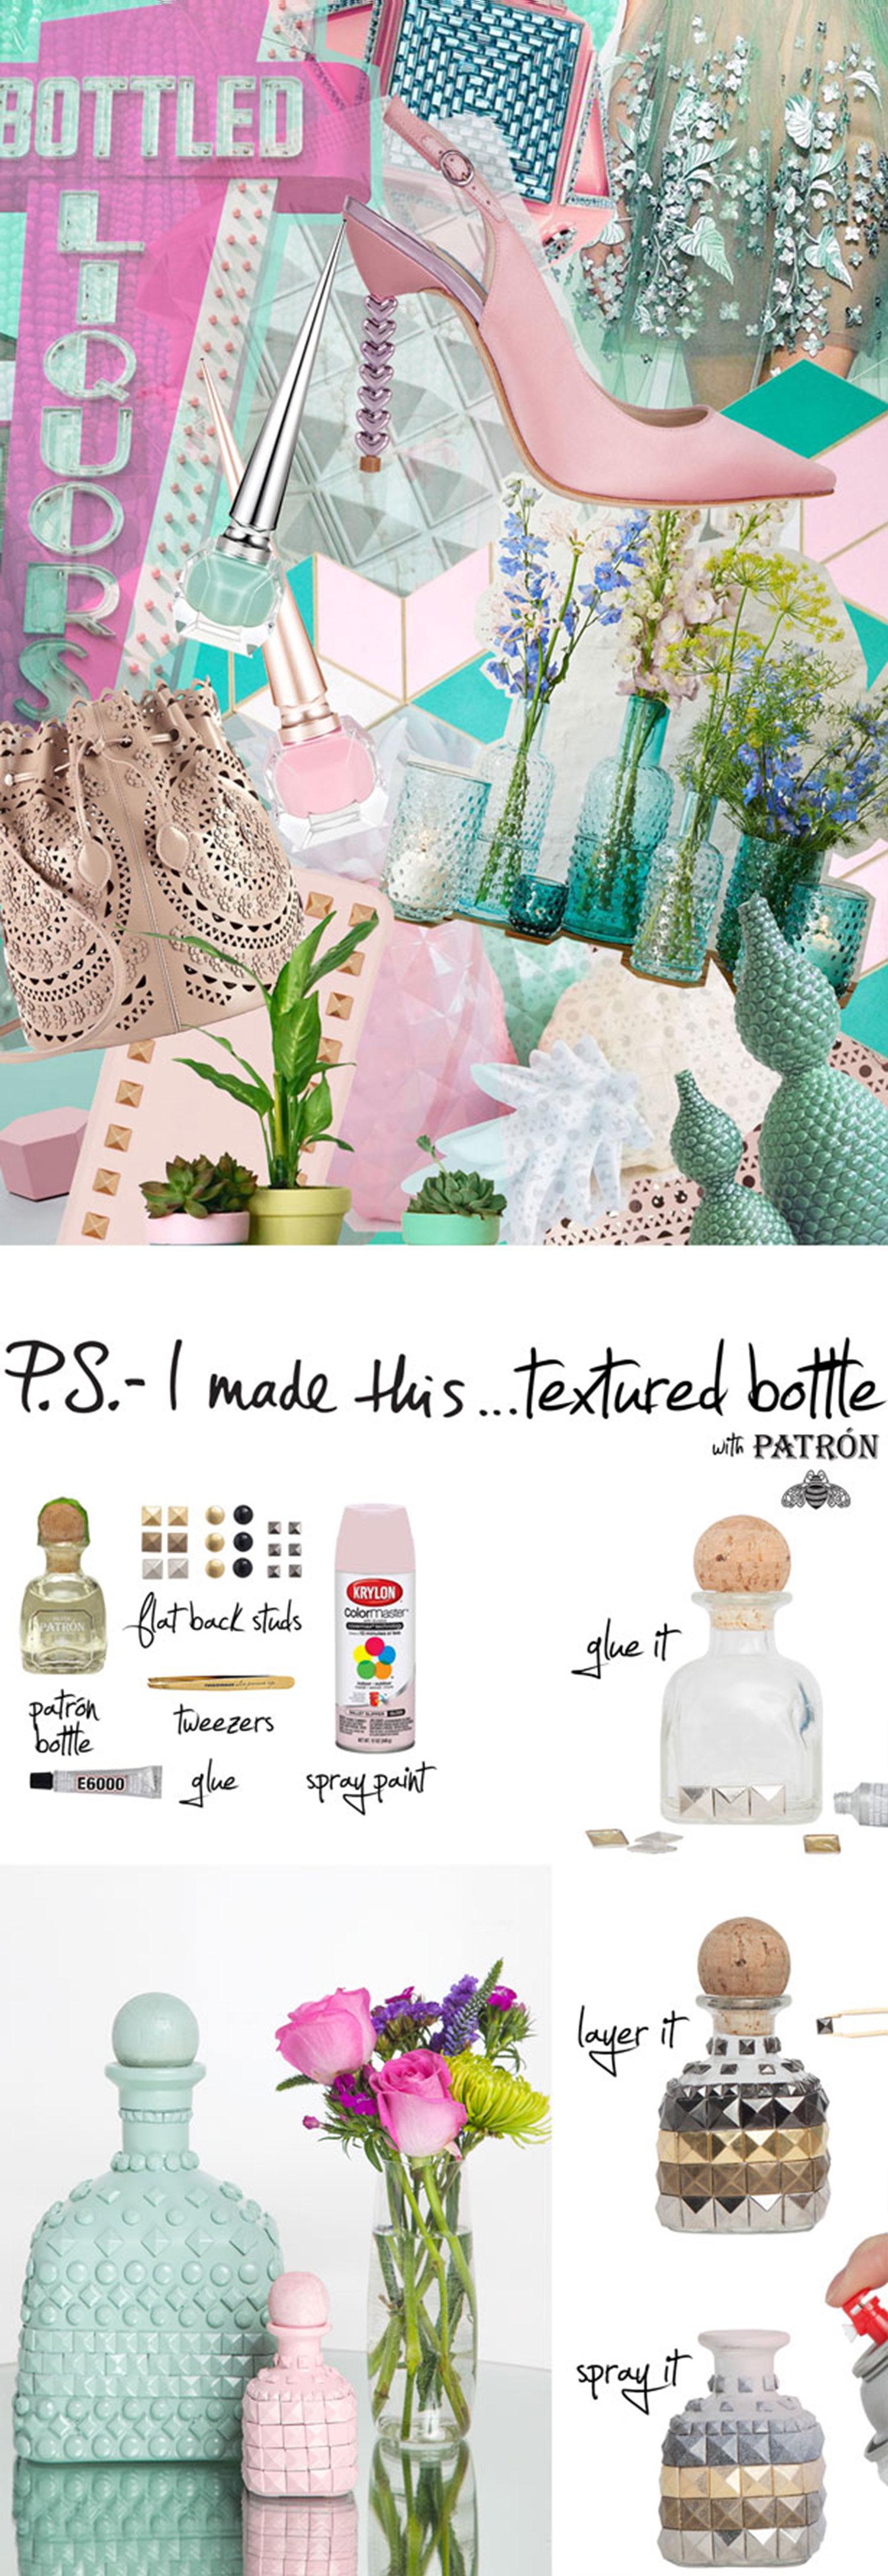 05.28.15_Patron_Textured-bottle-MERGED